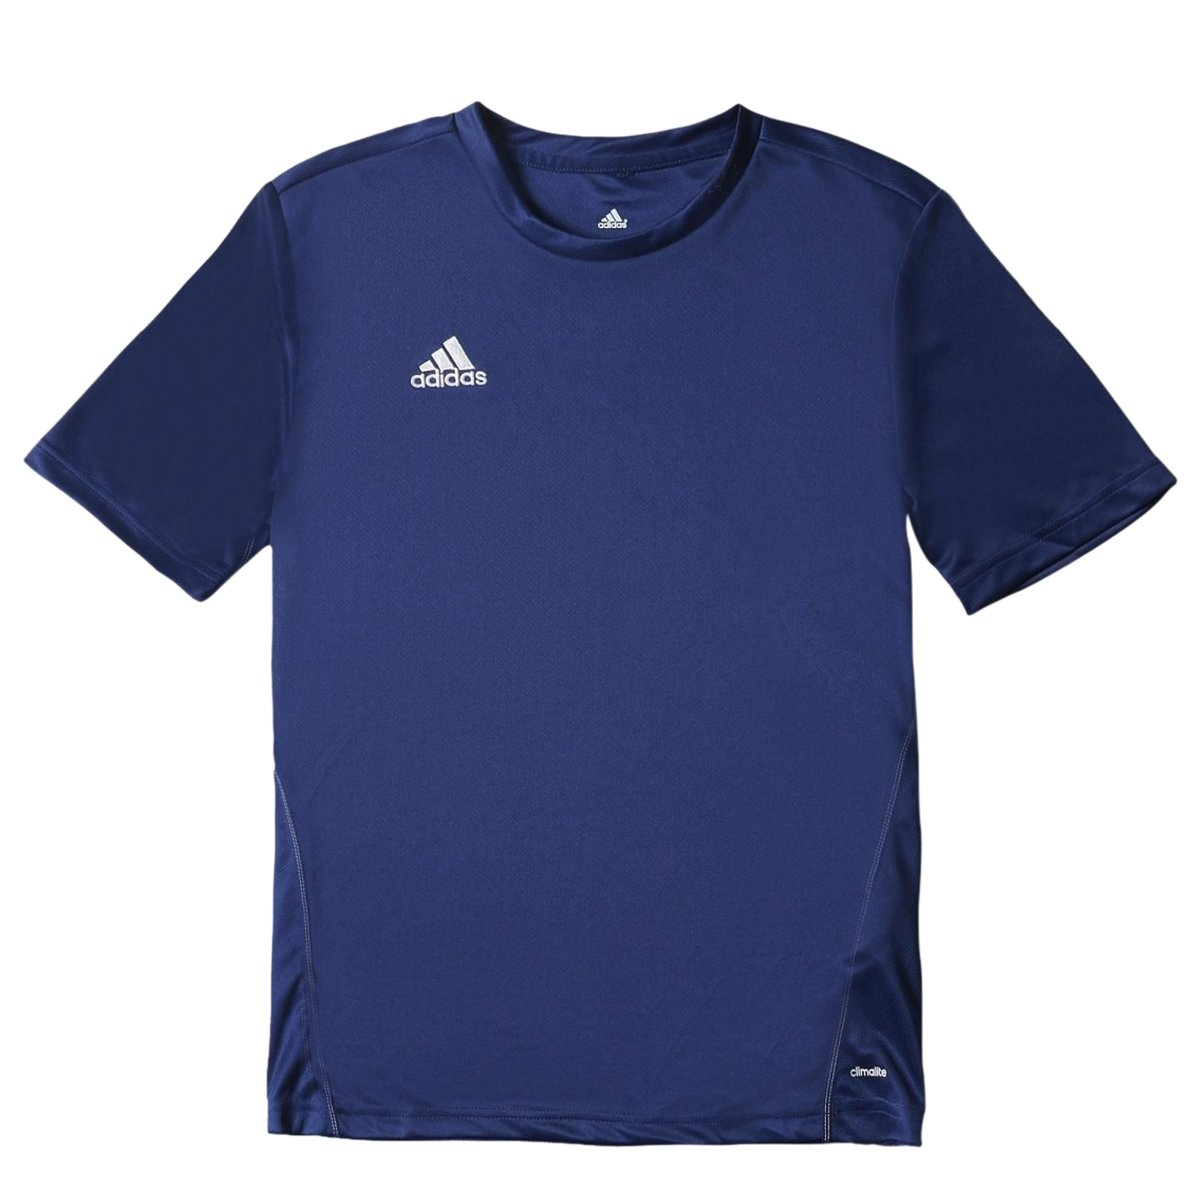 a18ec83bab4 Bizz Store - Camiseta Infantil Menino Adidas Treino Core 15 Futebol